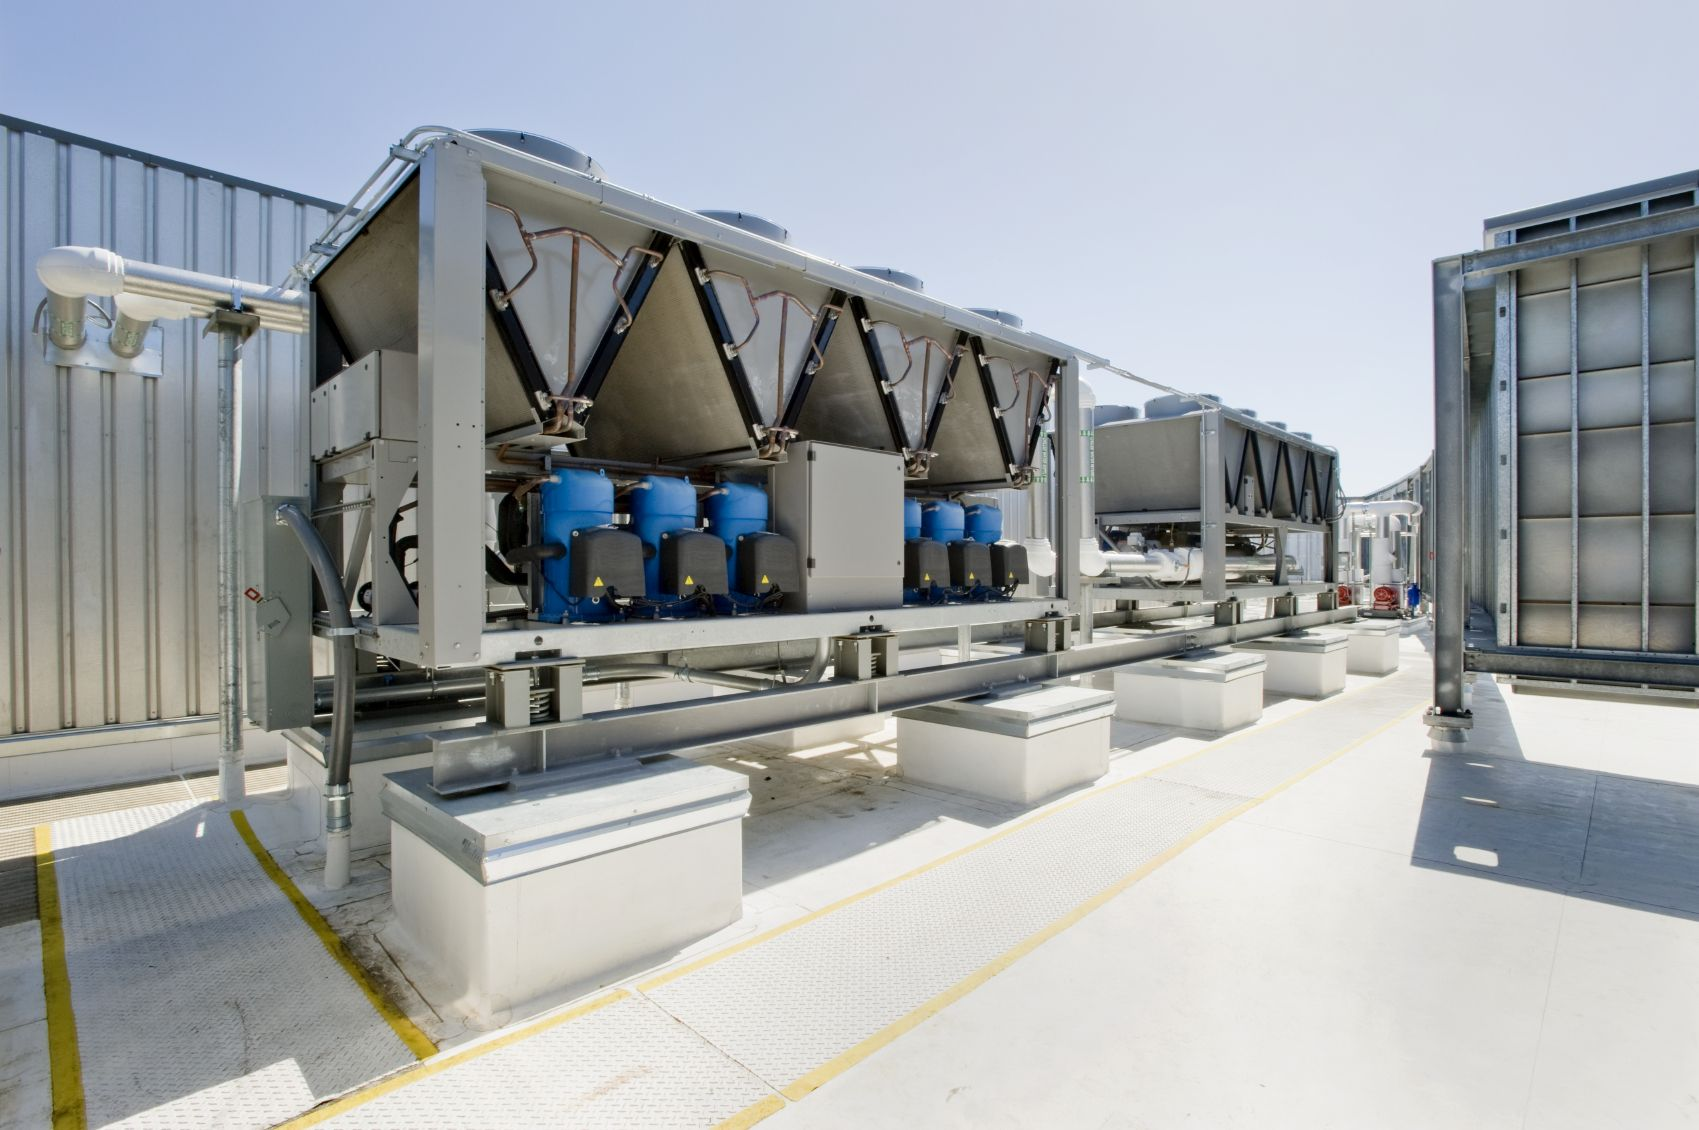 Industrial Refrigeration Jobs Near Me